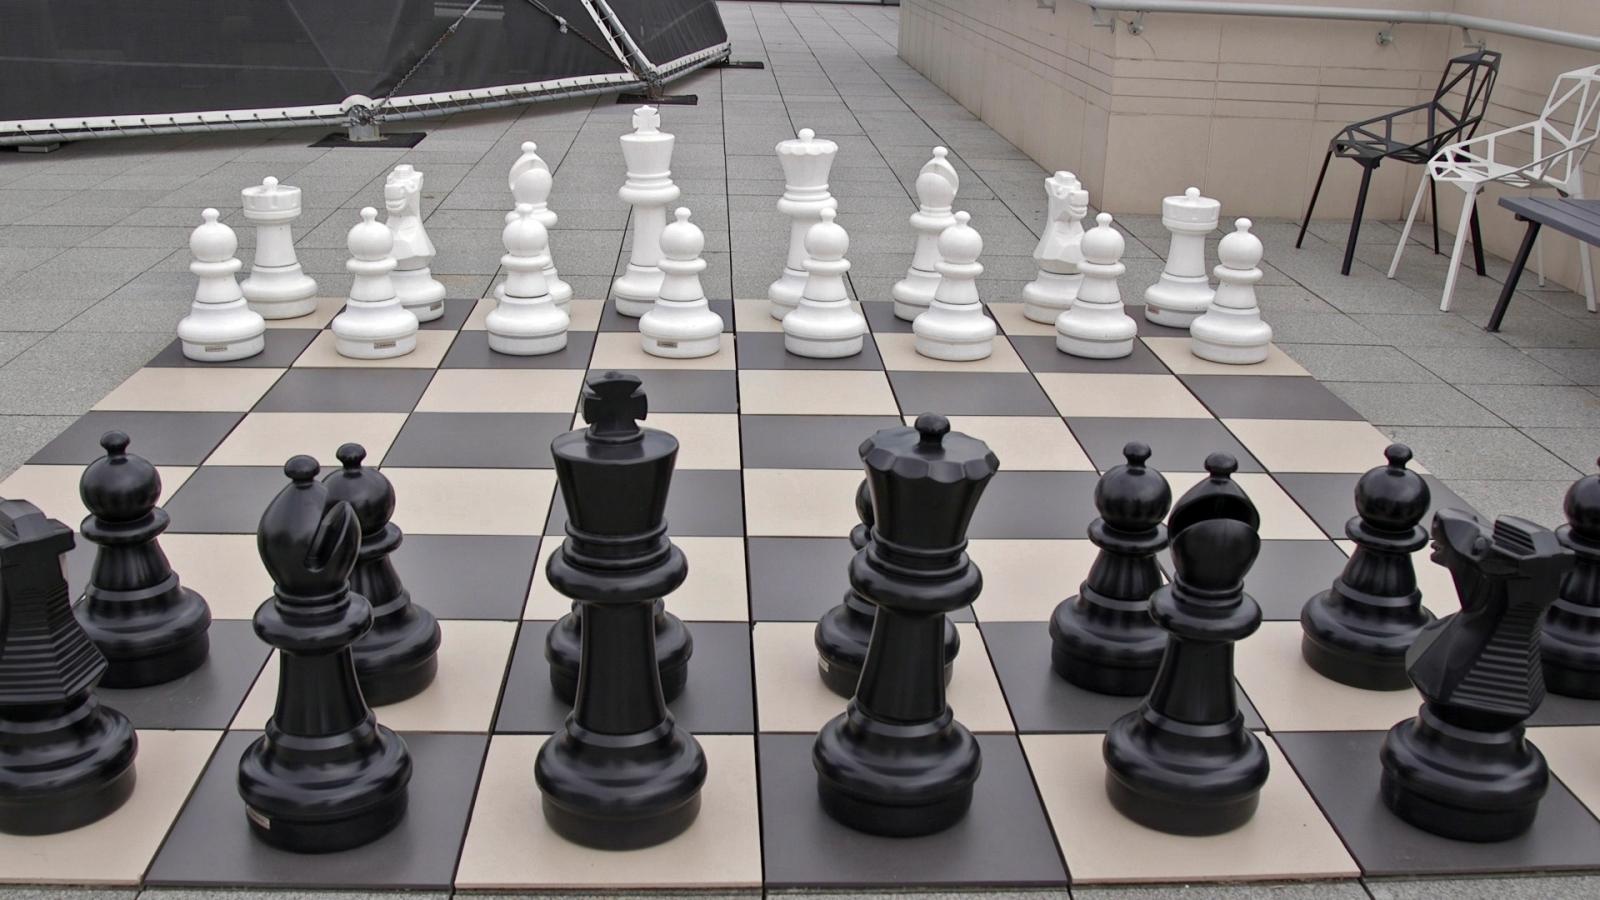 Yandex giant chess set